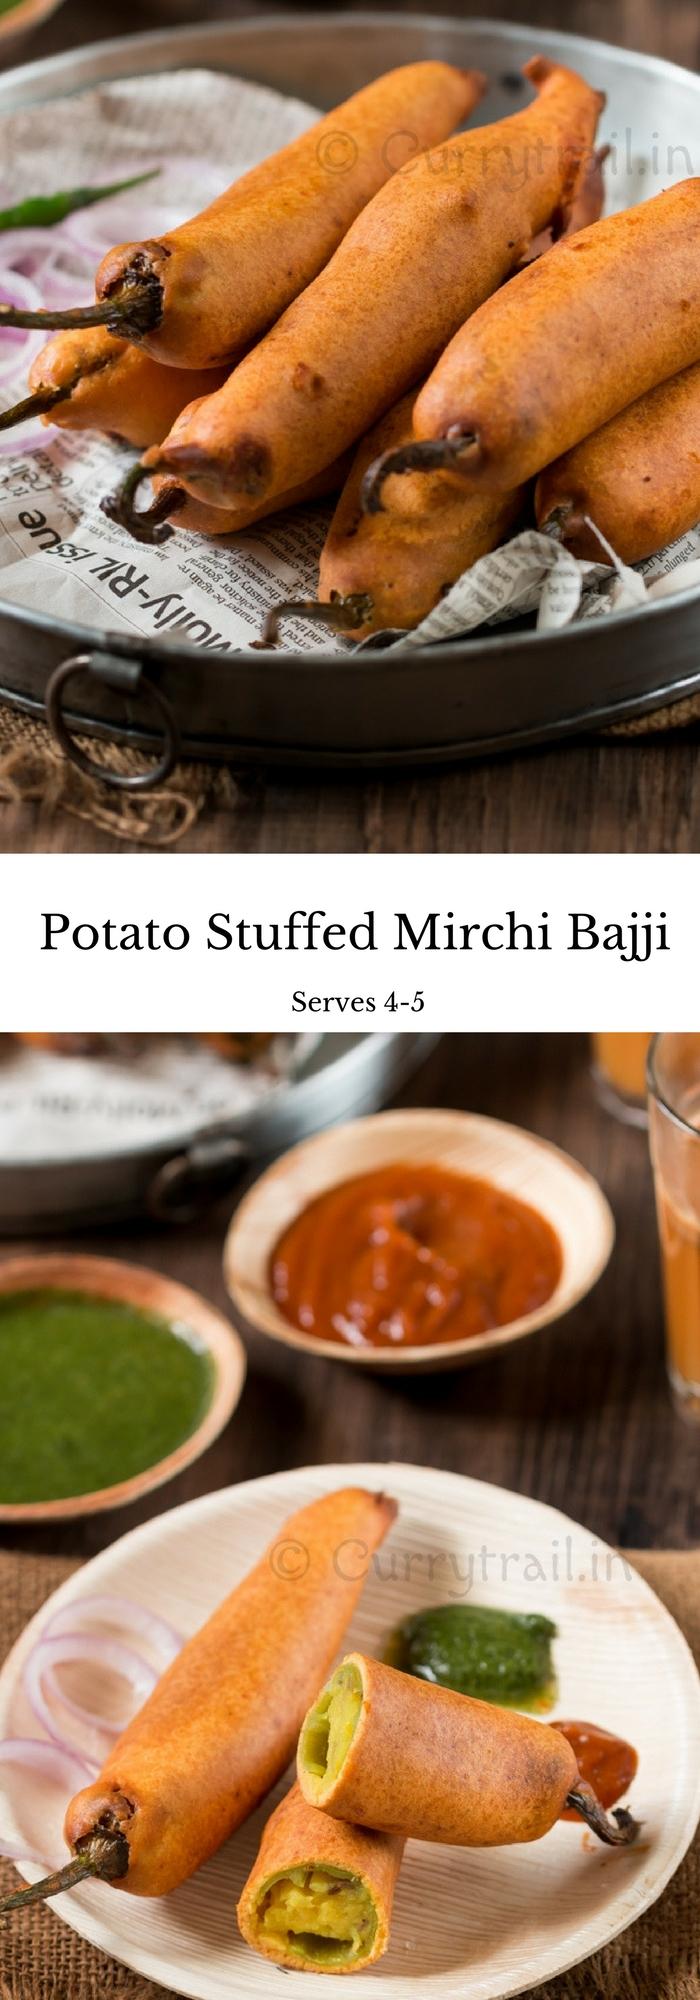 Potato Stuffed Mirchi Bajji